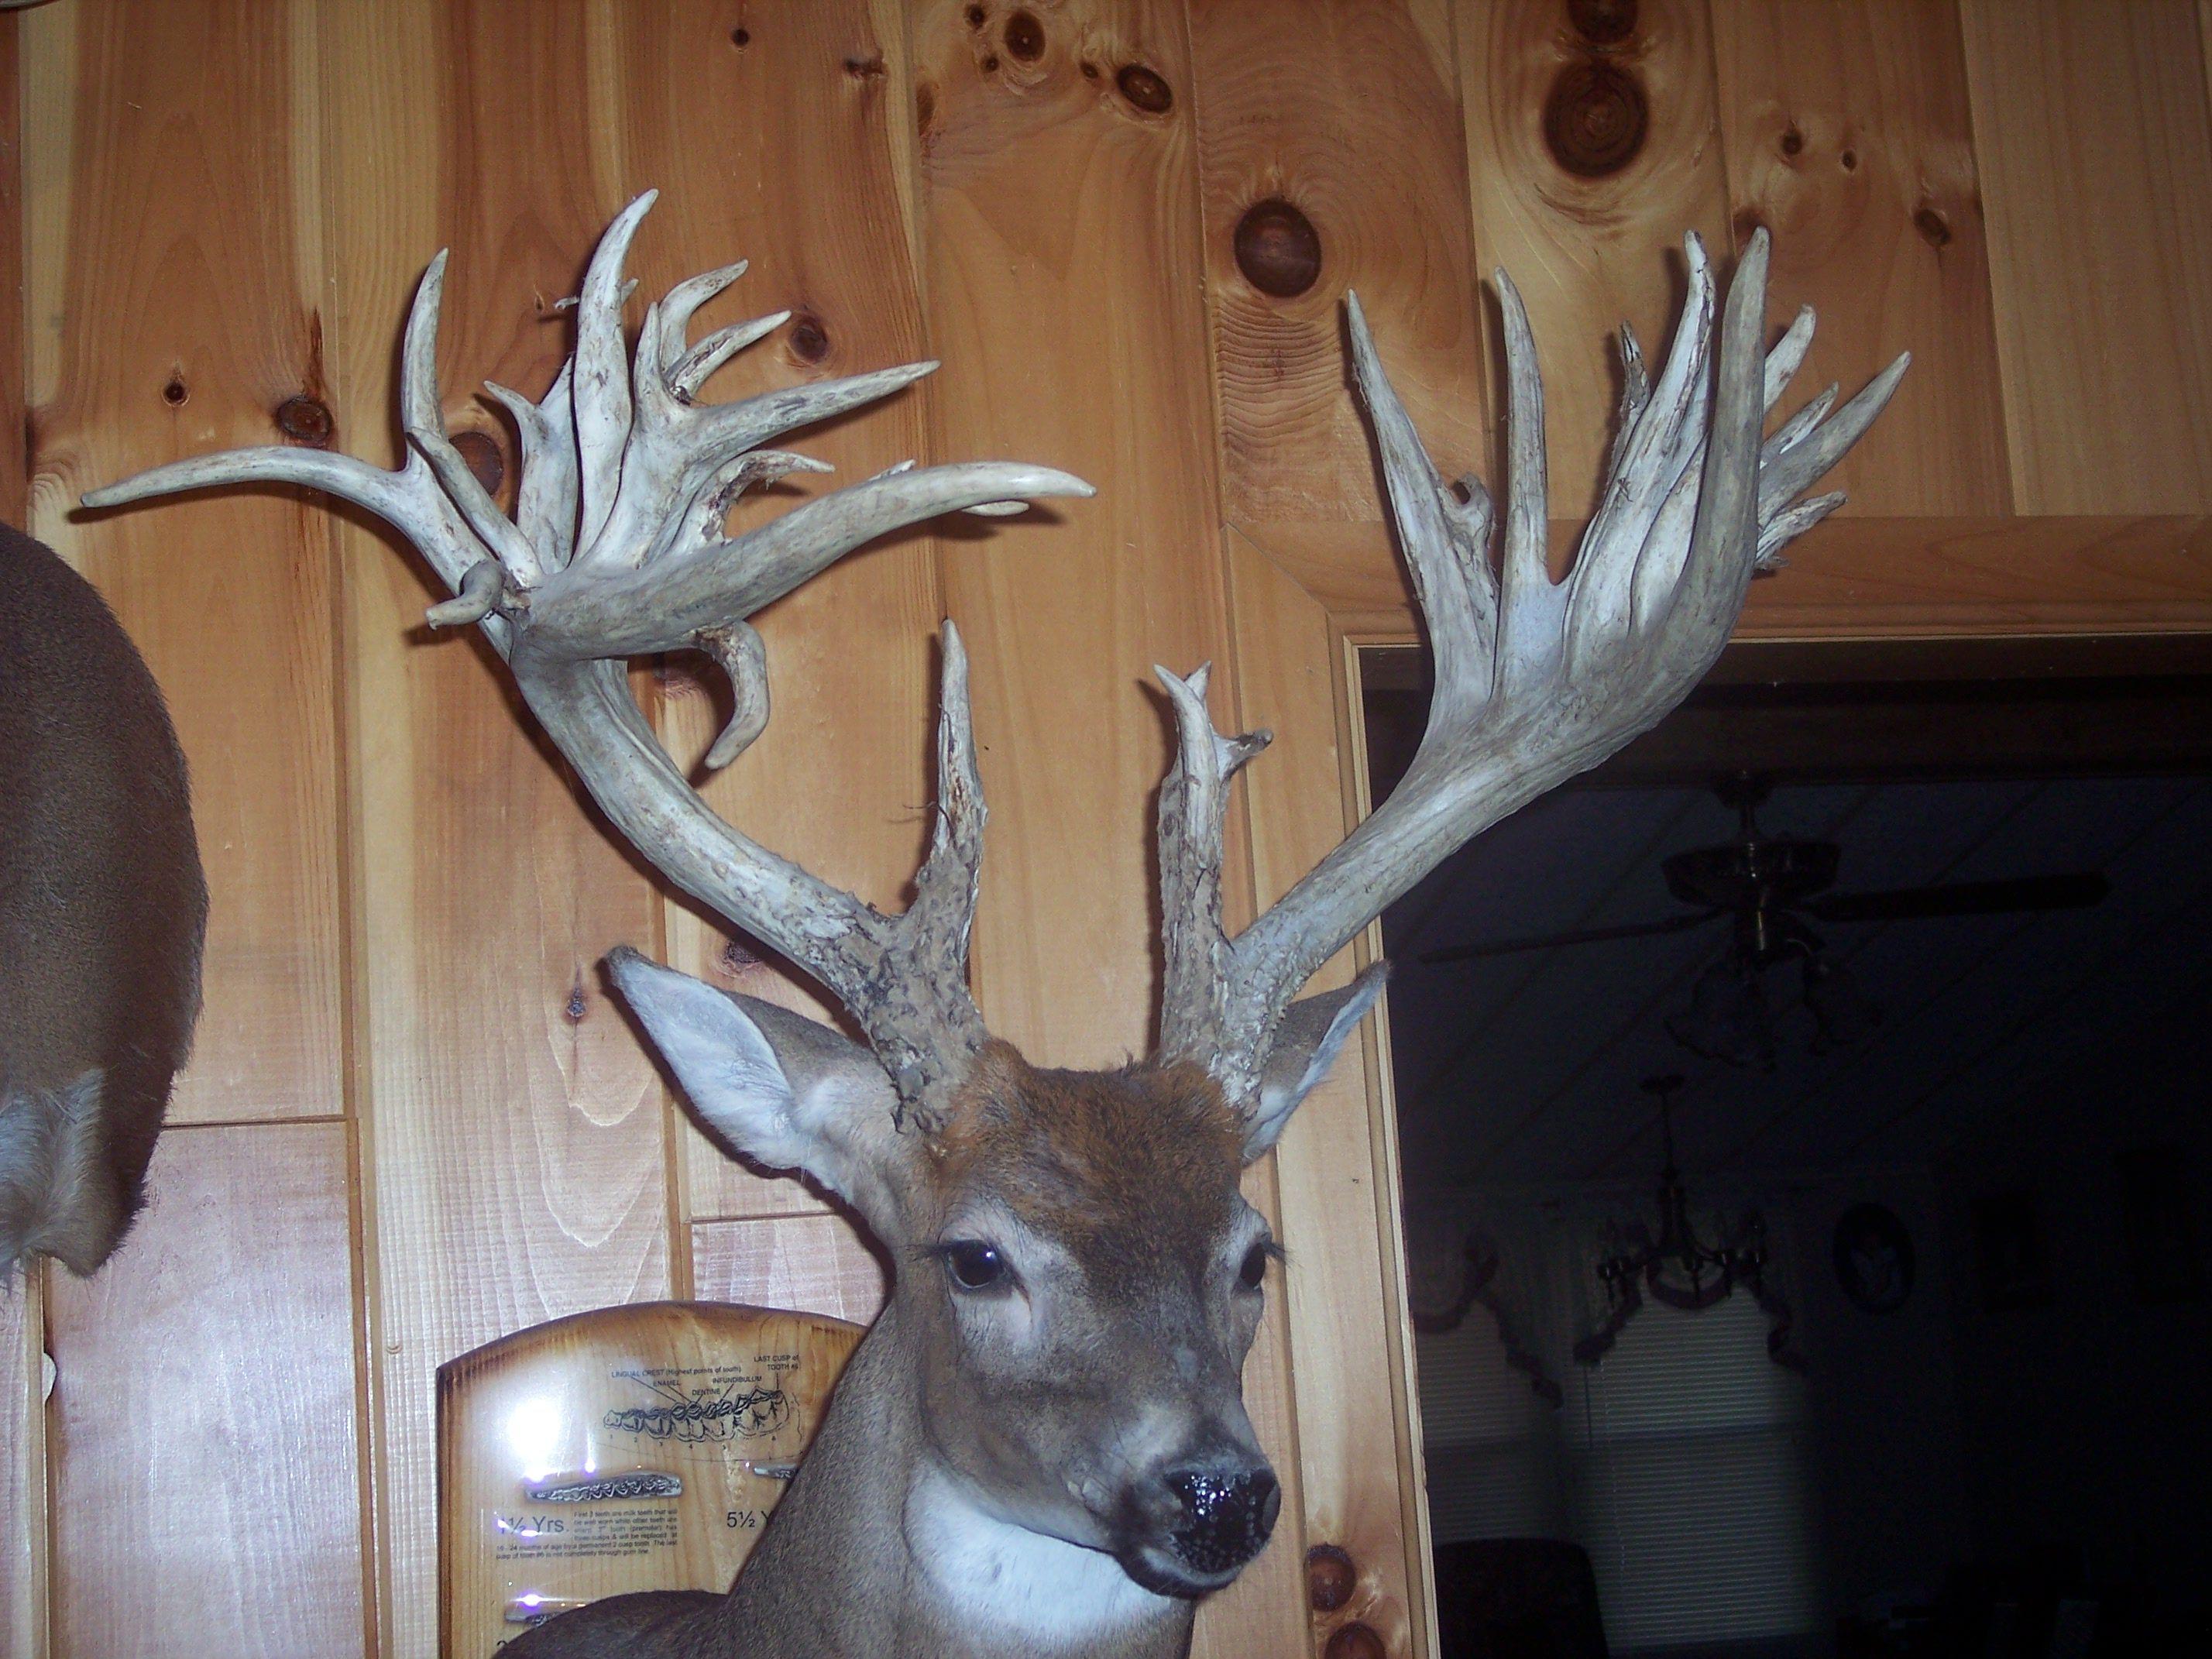 BUCKCOUNTRY Deer mounts, Deer, Taxidermy